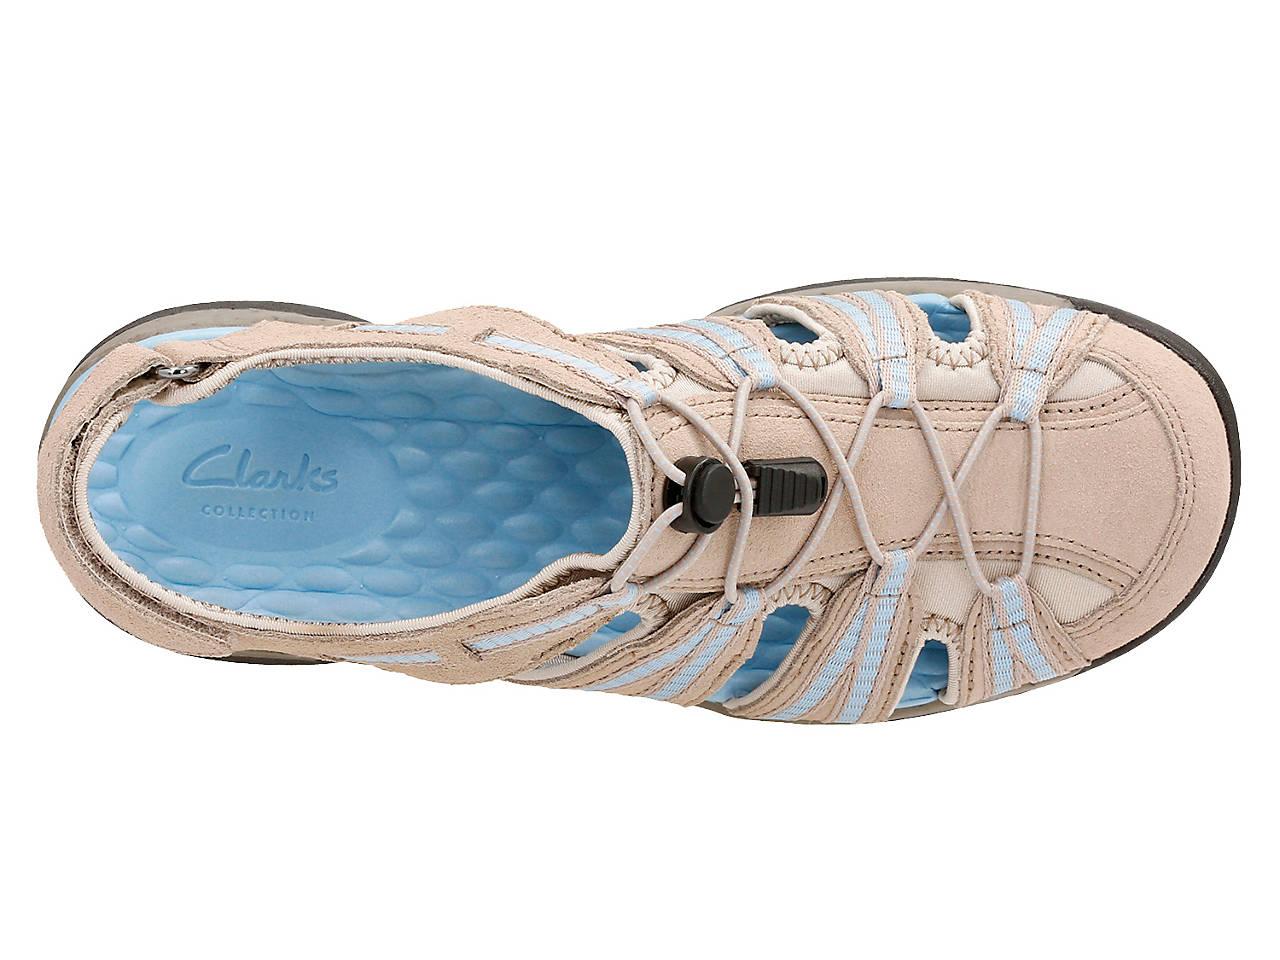 b7a27235076b Clarks Tuvia Maddee Sandal Women s Shoes